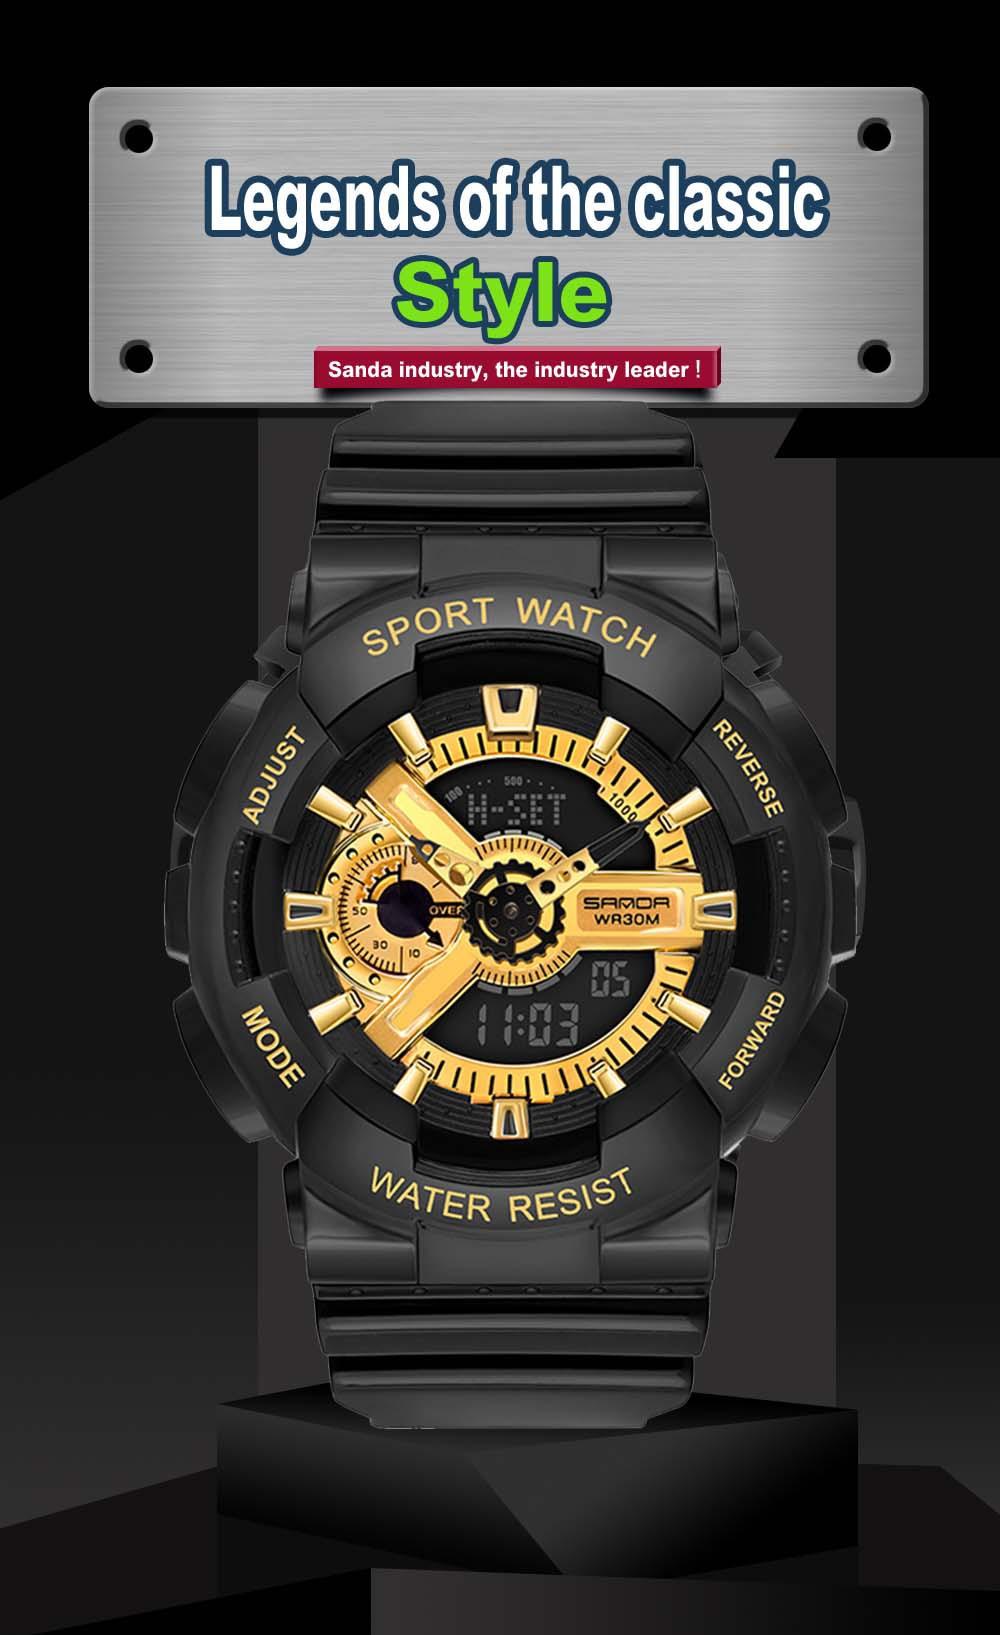 H6a1e1109da574997bd3196c4e855306aQ 2020 SANDA Military Men's Watch Brand Luxury Waterproof Sport Wristwatch Fashion Quartz Clock Couple Watch relogio masculino